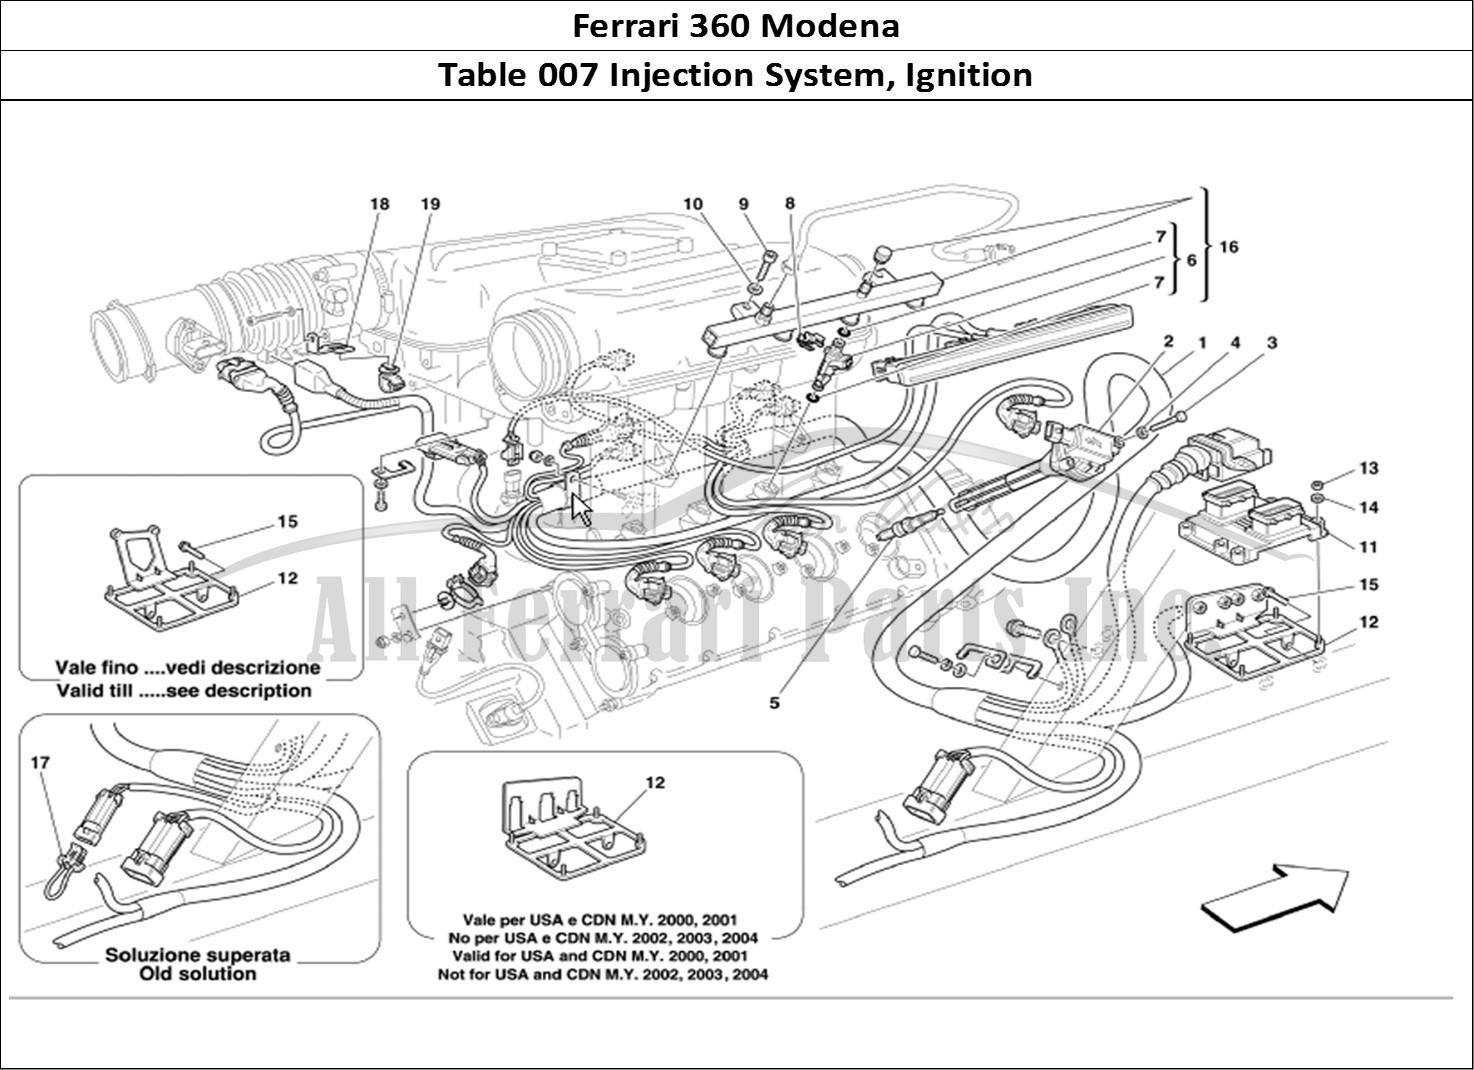 Buy Original Ferrari 360 Modena 007 Injection System